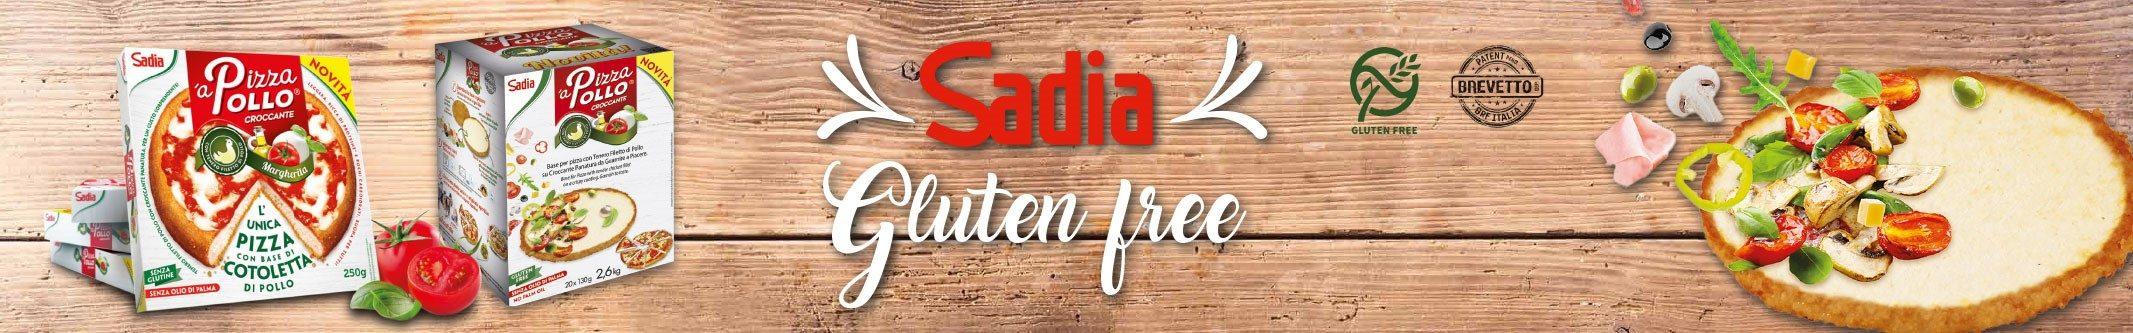 Sadia PIZZA POLLO foodservice